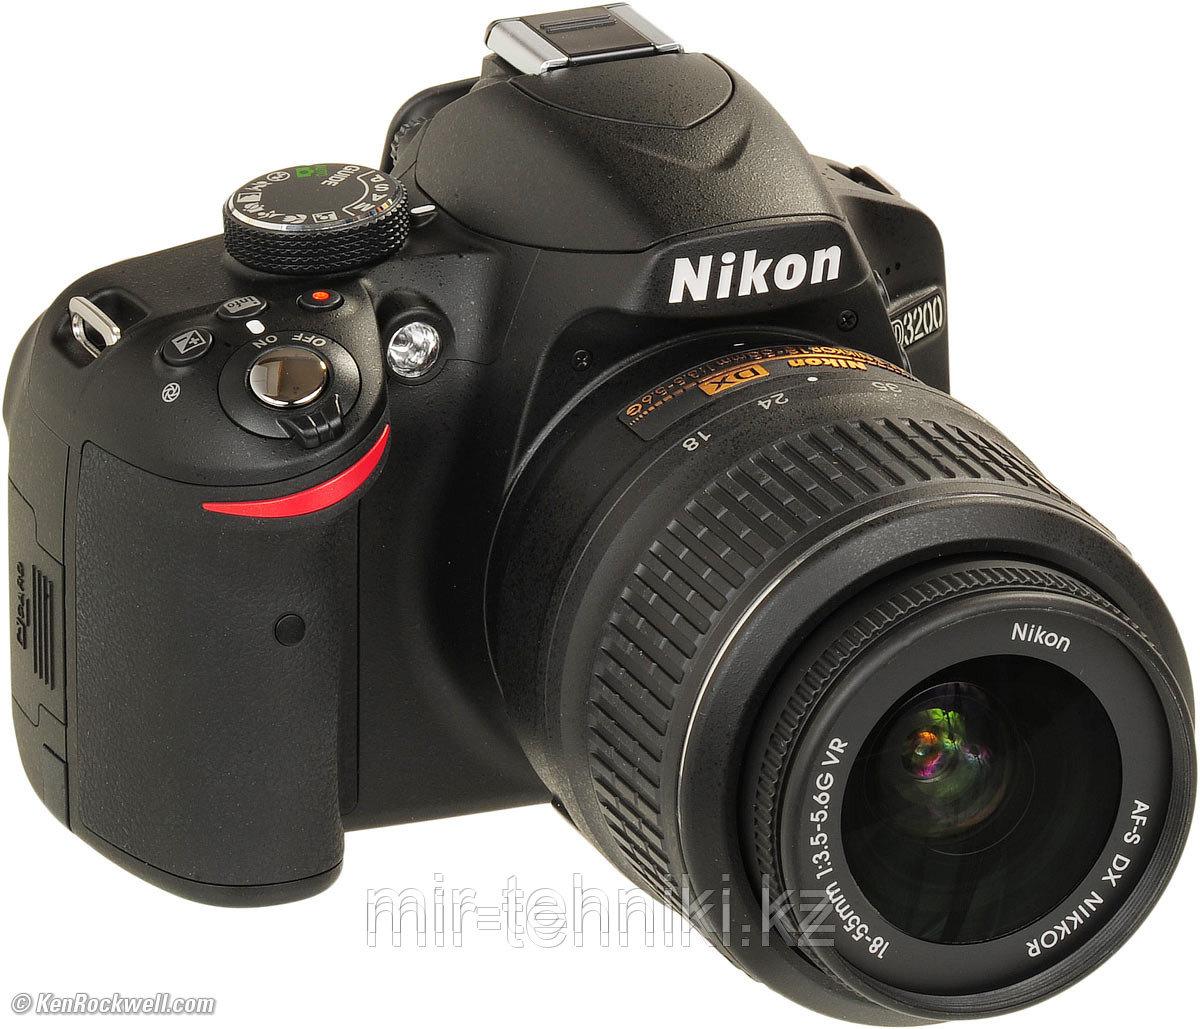 Фотоаппарат Nikon D3400 Kit 18-55mm  f/3.5-5.6 G VR